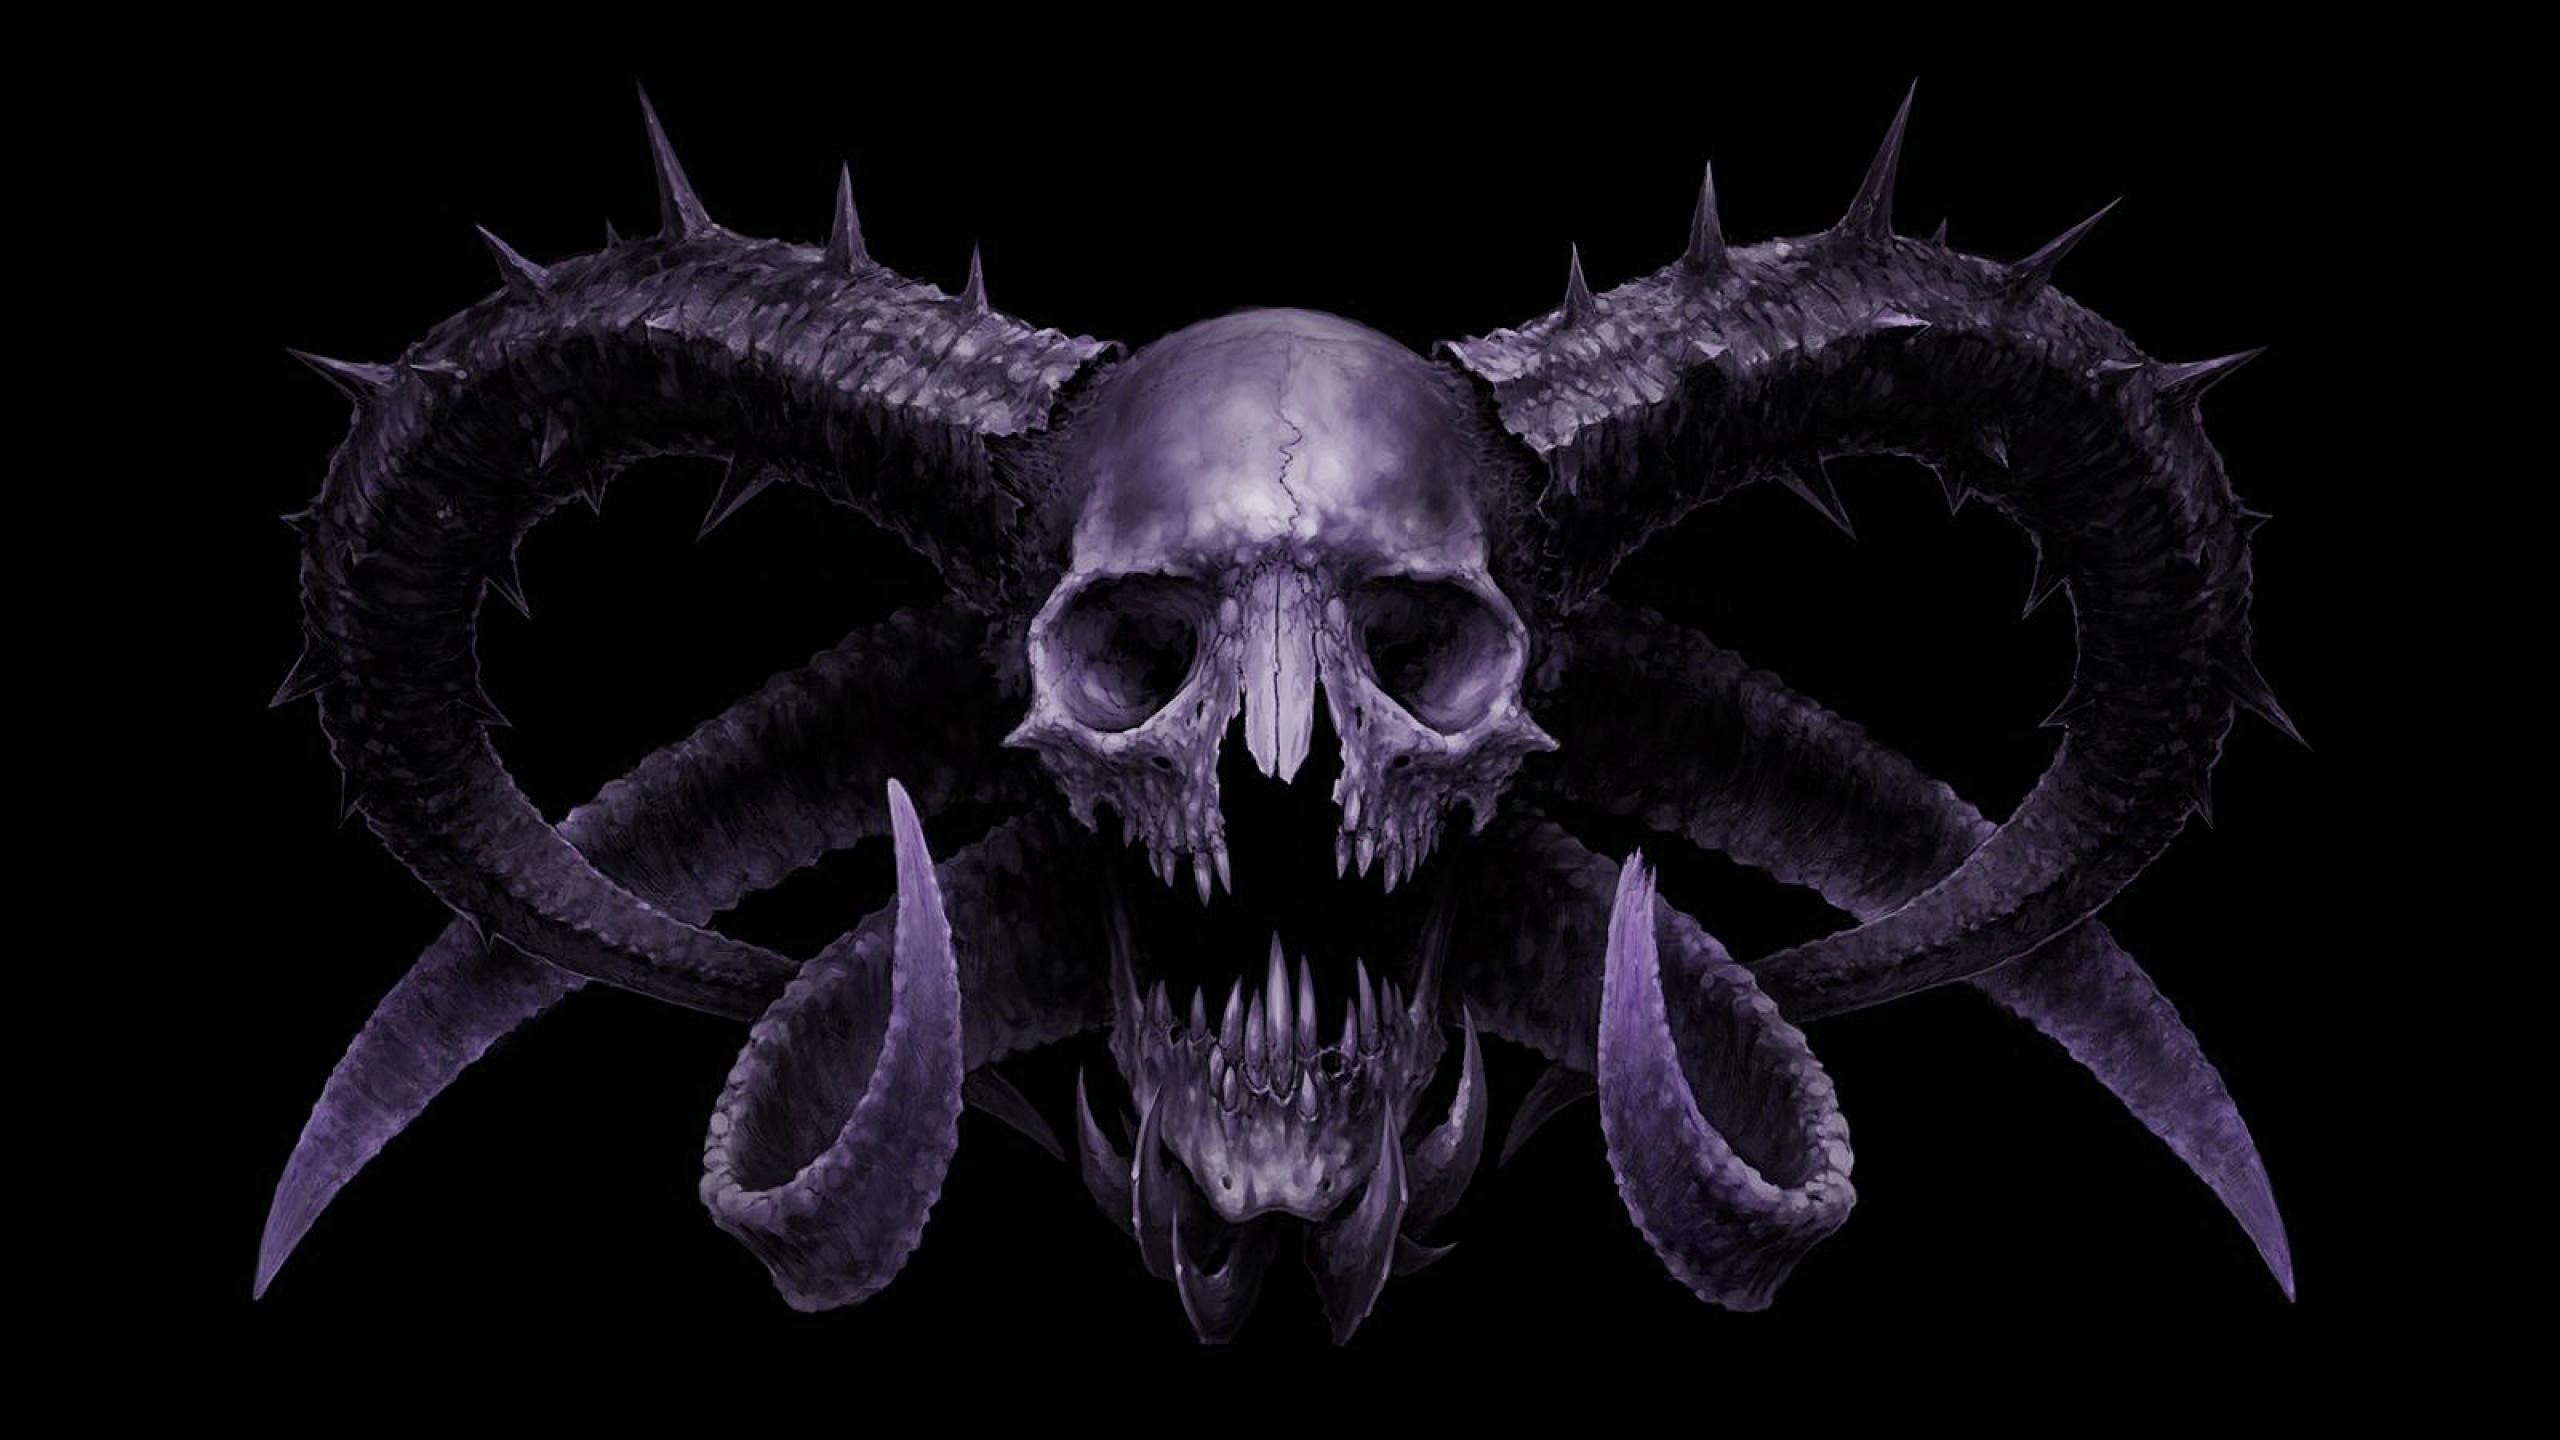 Wallpapers Skull Demon Hd 2560×1440